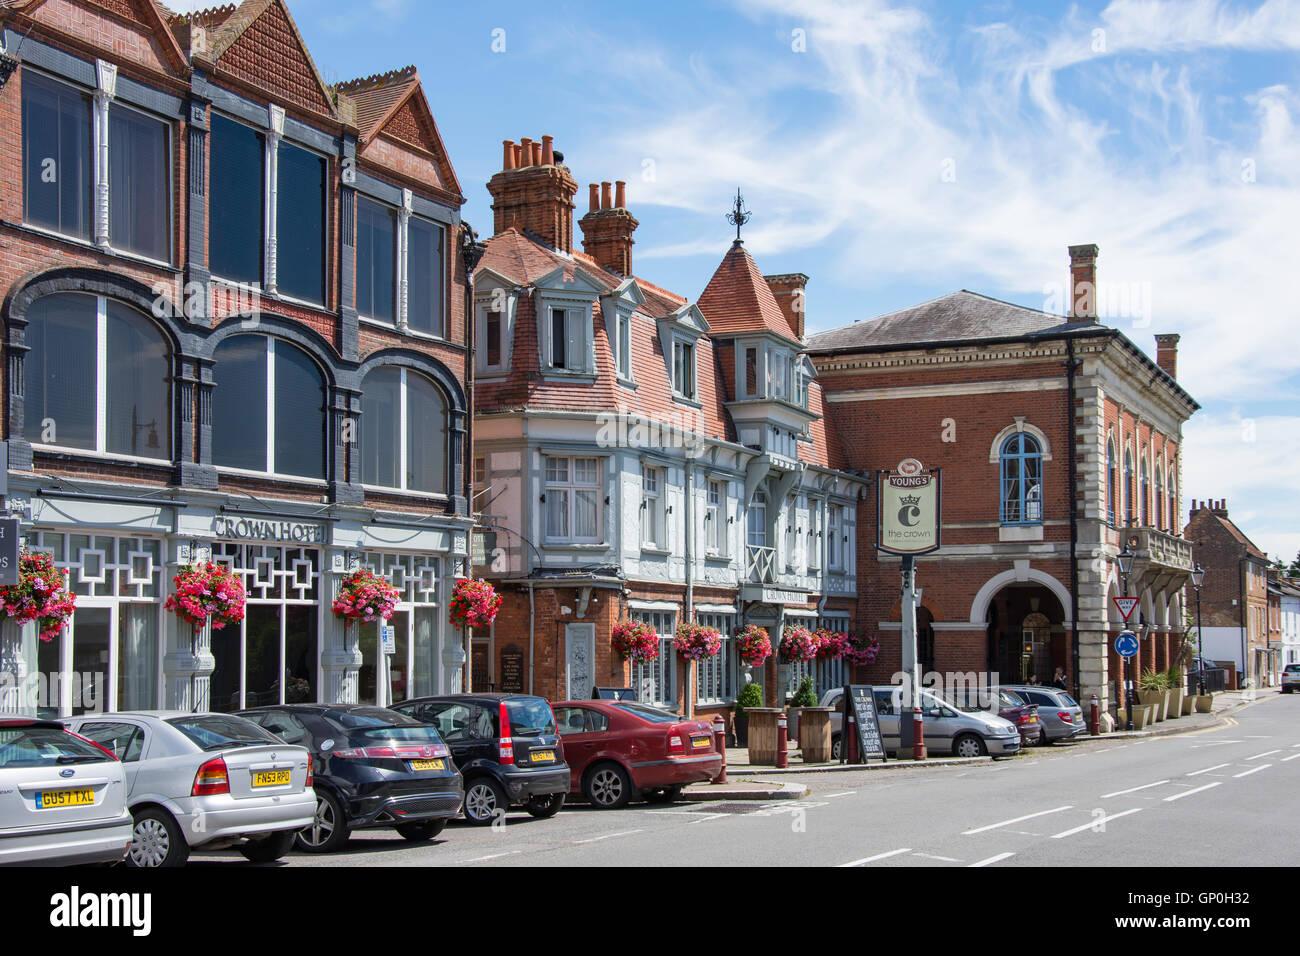 The Crown Hotel Windsor Street Chertsey Surrey England